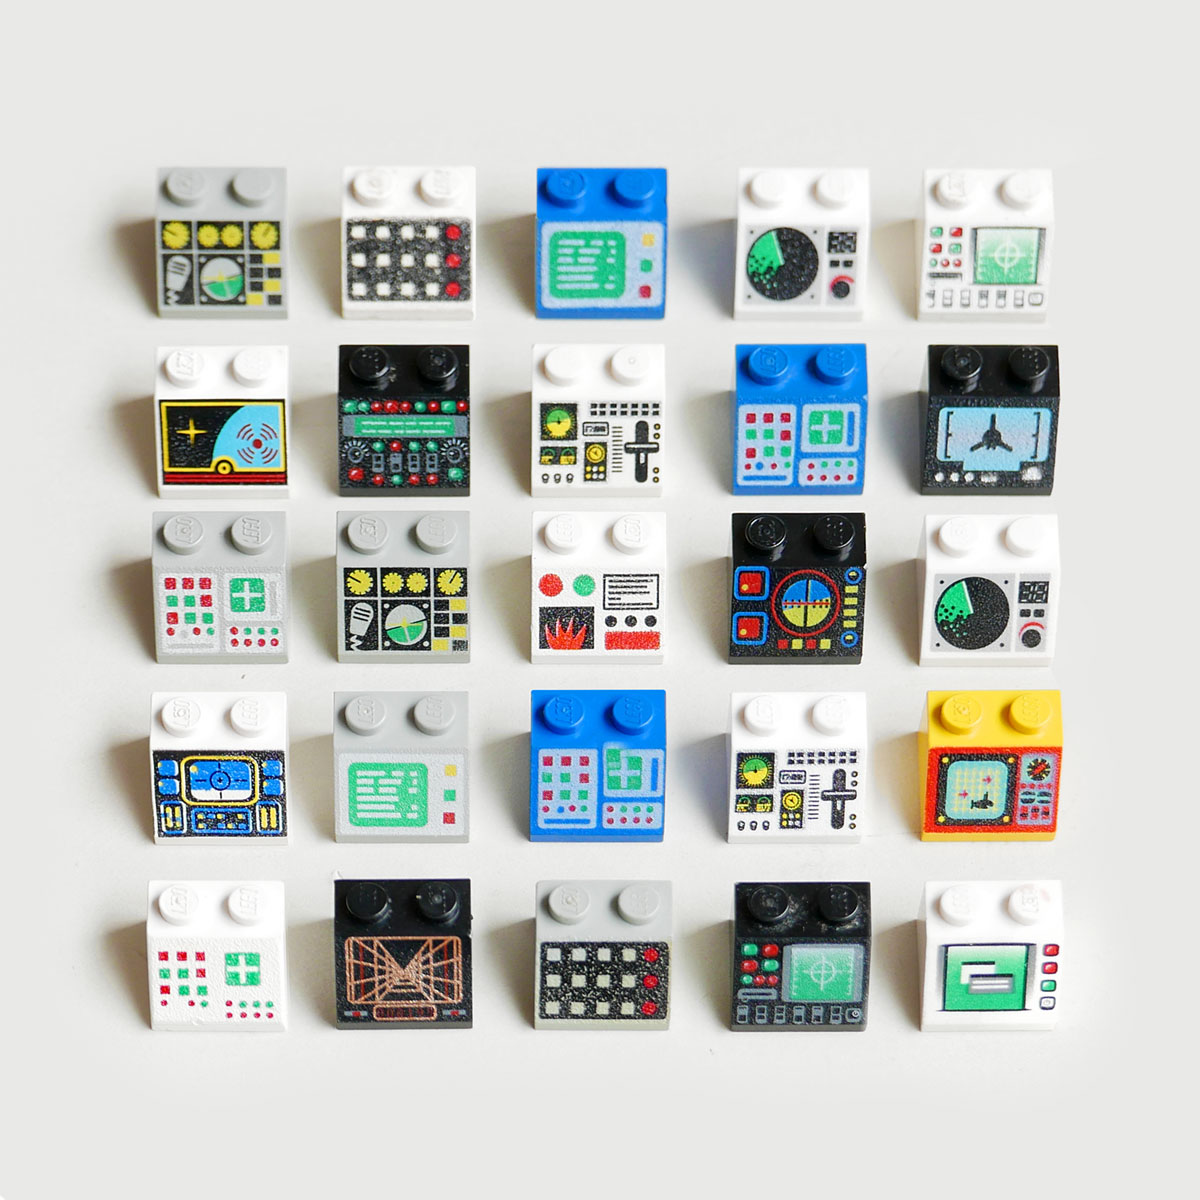 Present & Correct — Typology of Lego Computers